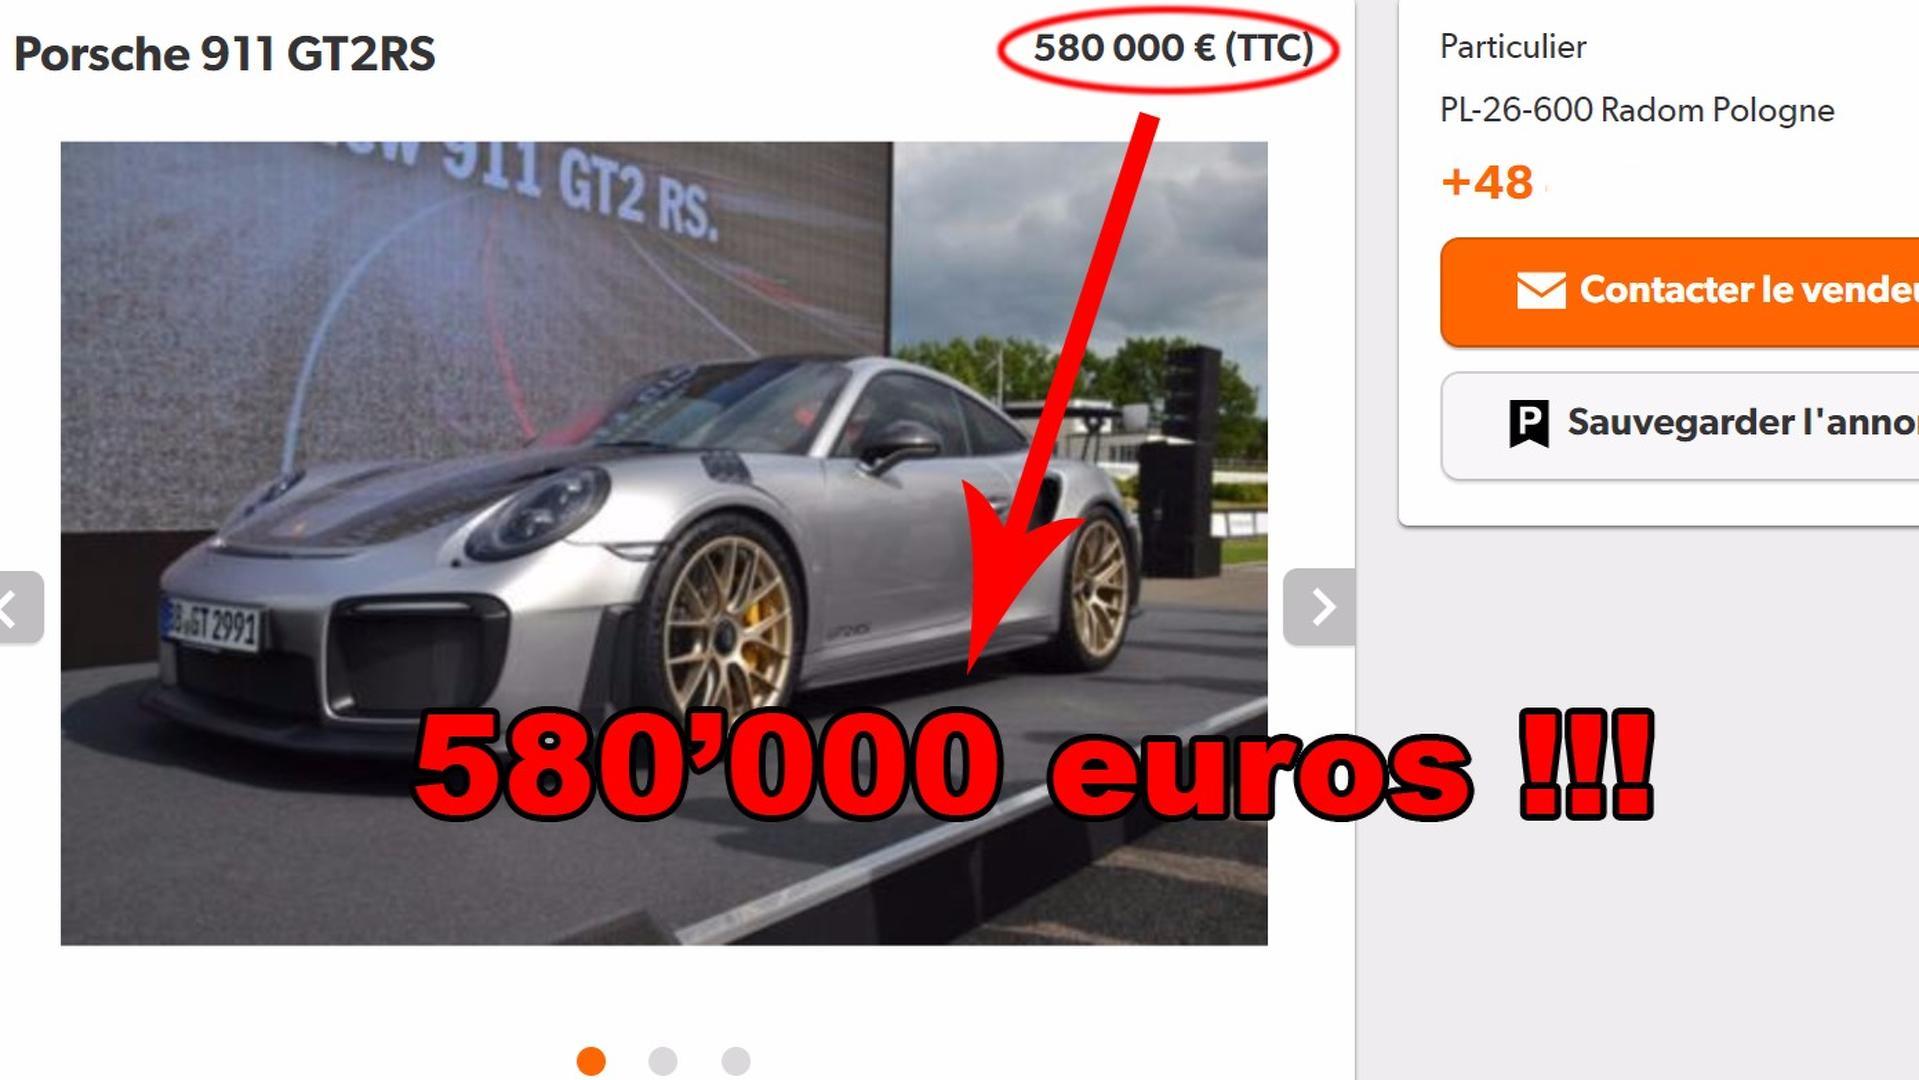 porsche-911-gt2-rs-speculation Gorgeous Porsche 911 Gt2 Rs Essai Cars Trend